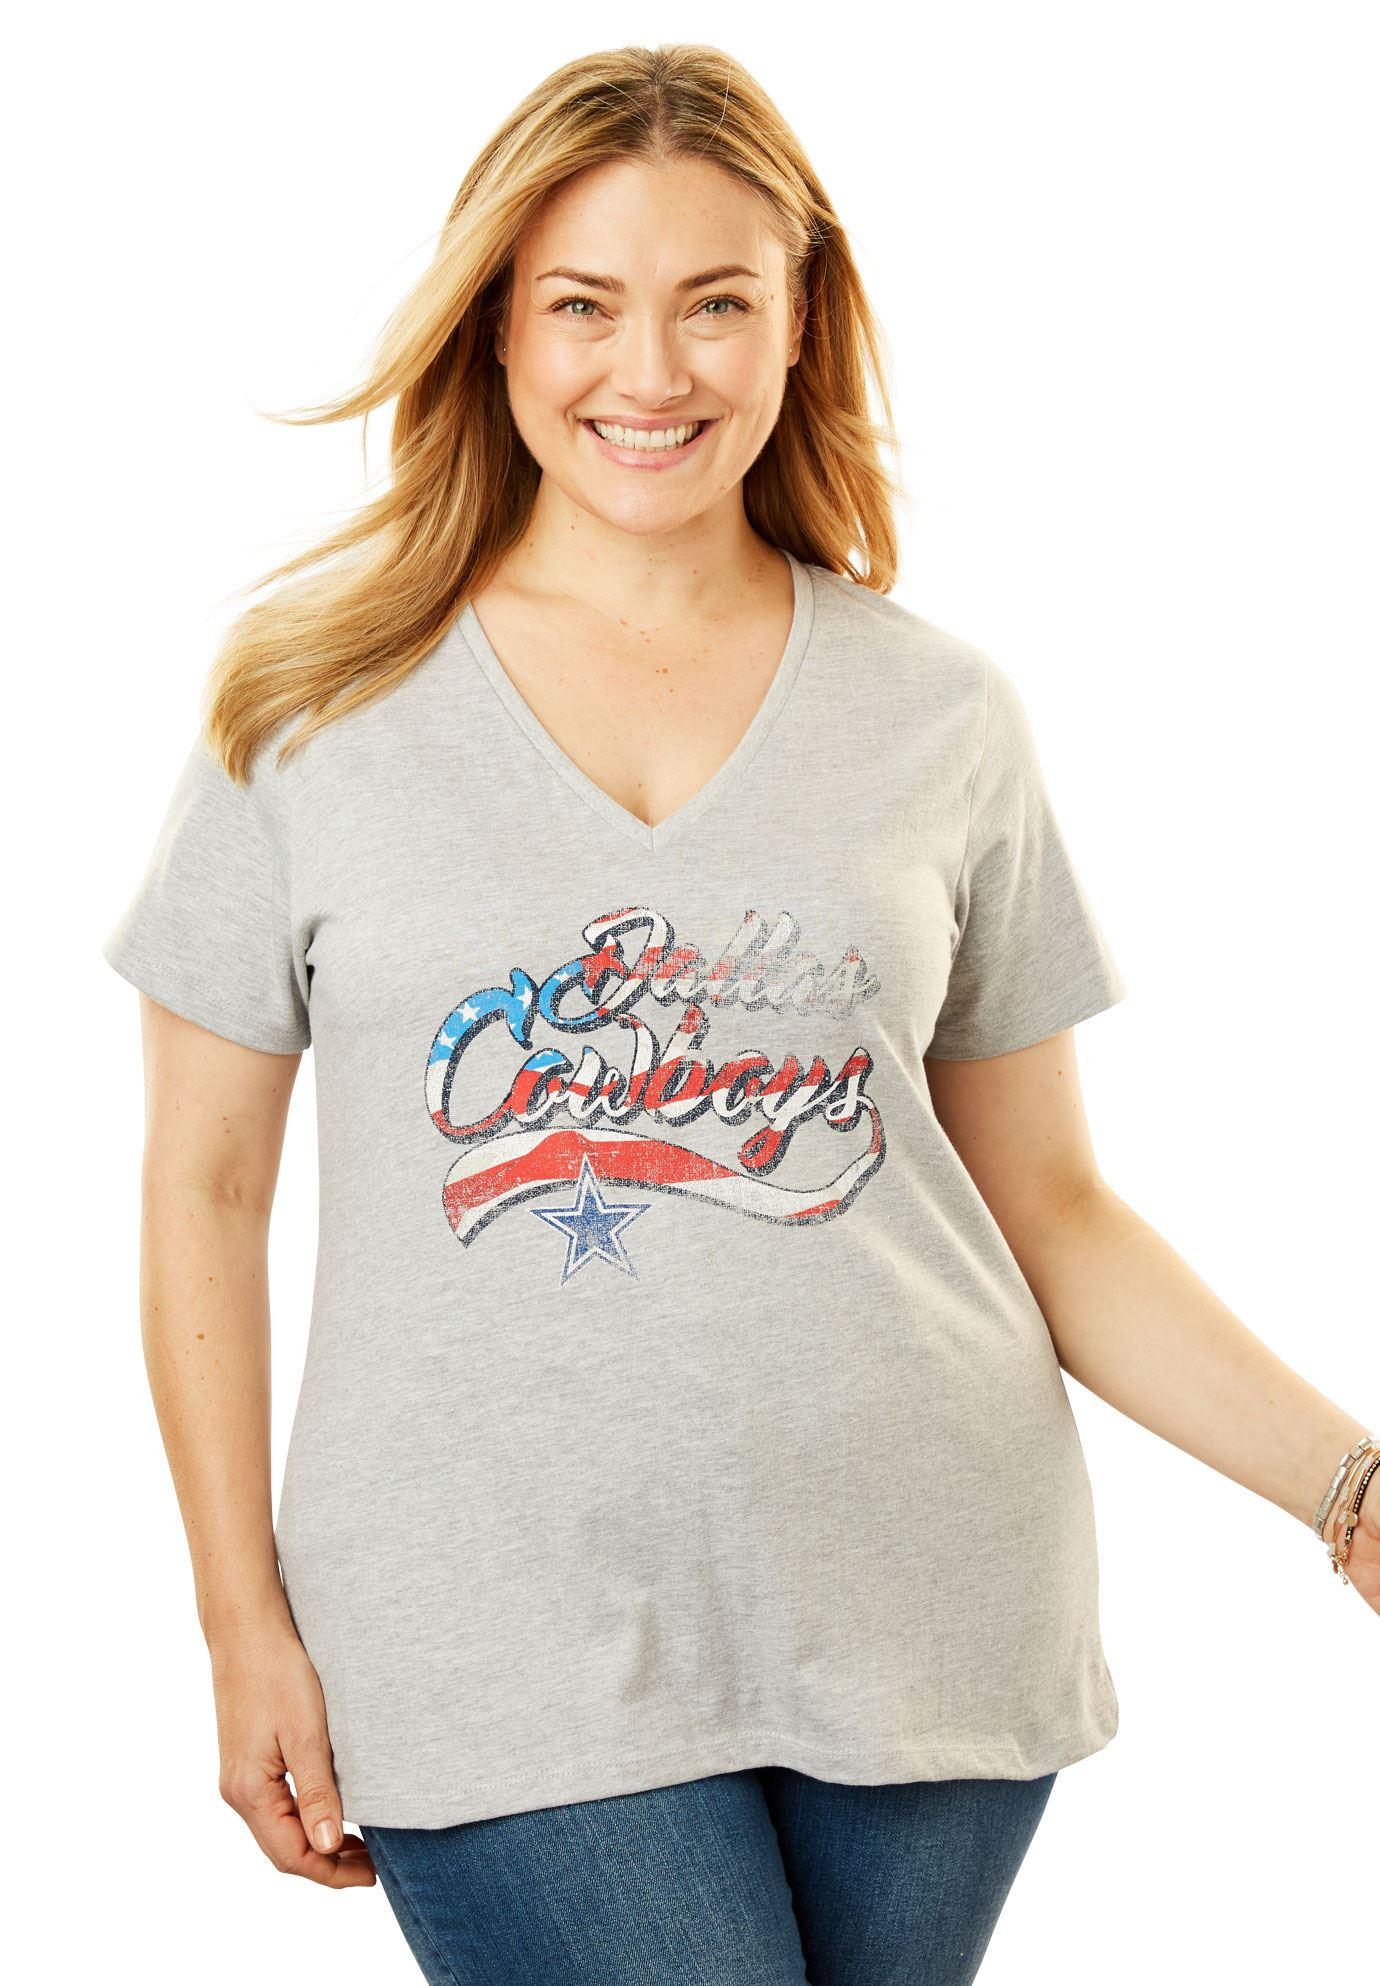 Dallas Cowboys Americana Tee - Women s Plus Size Clothing  3fe57f442